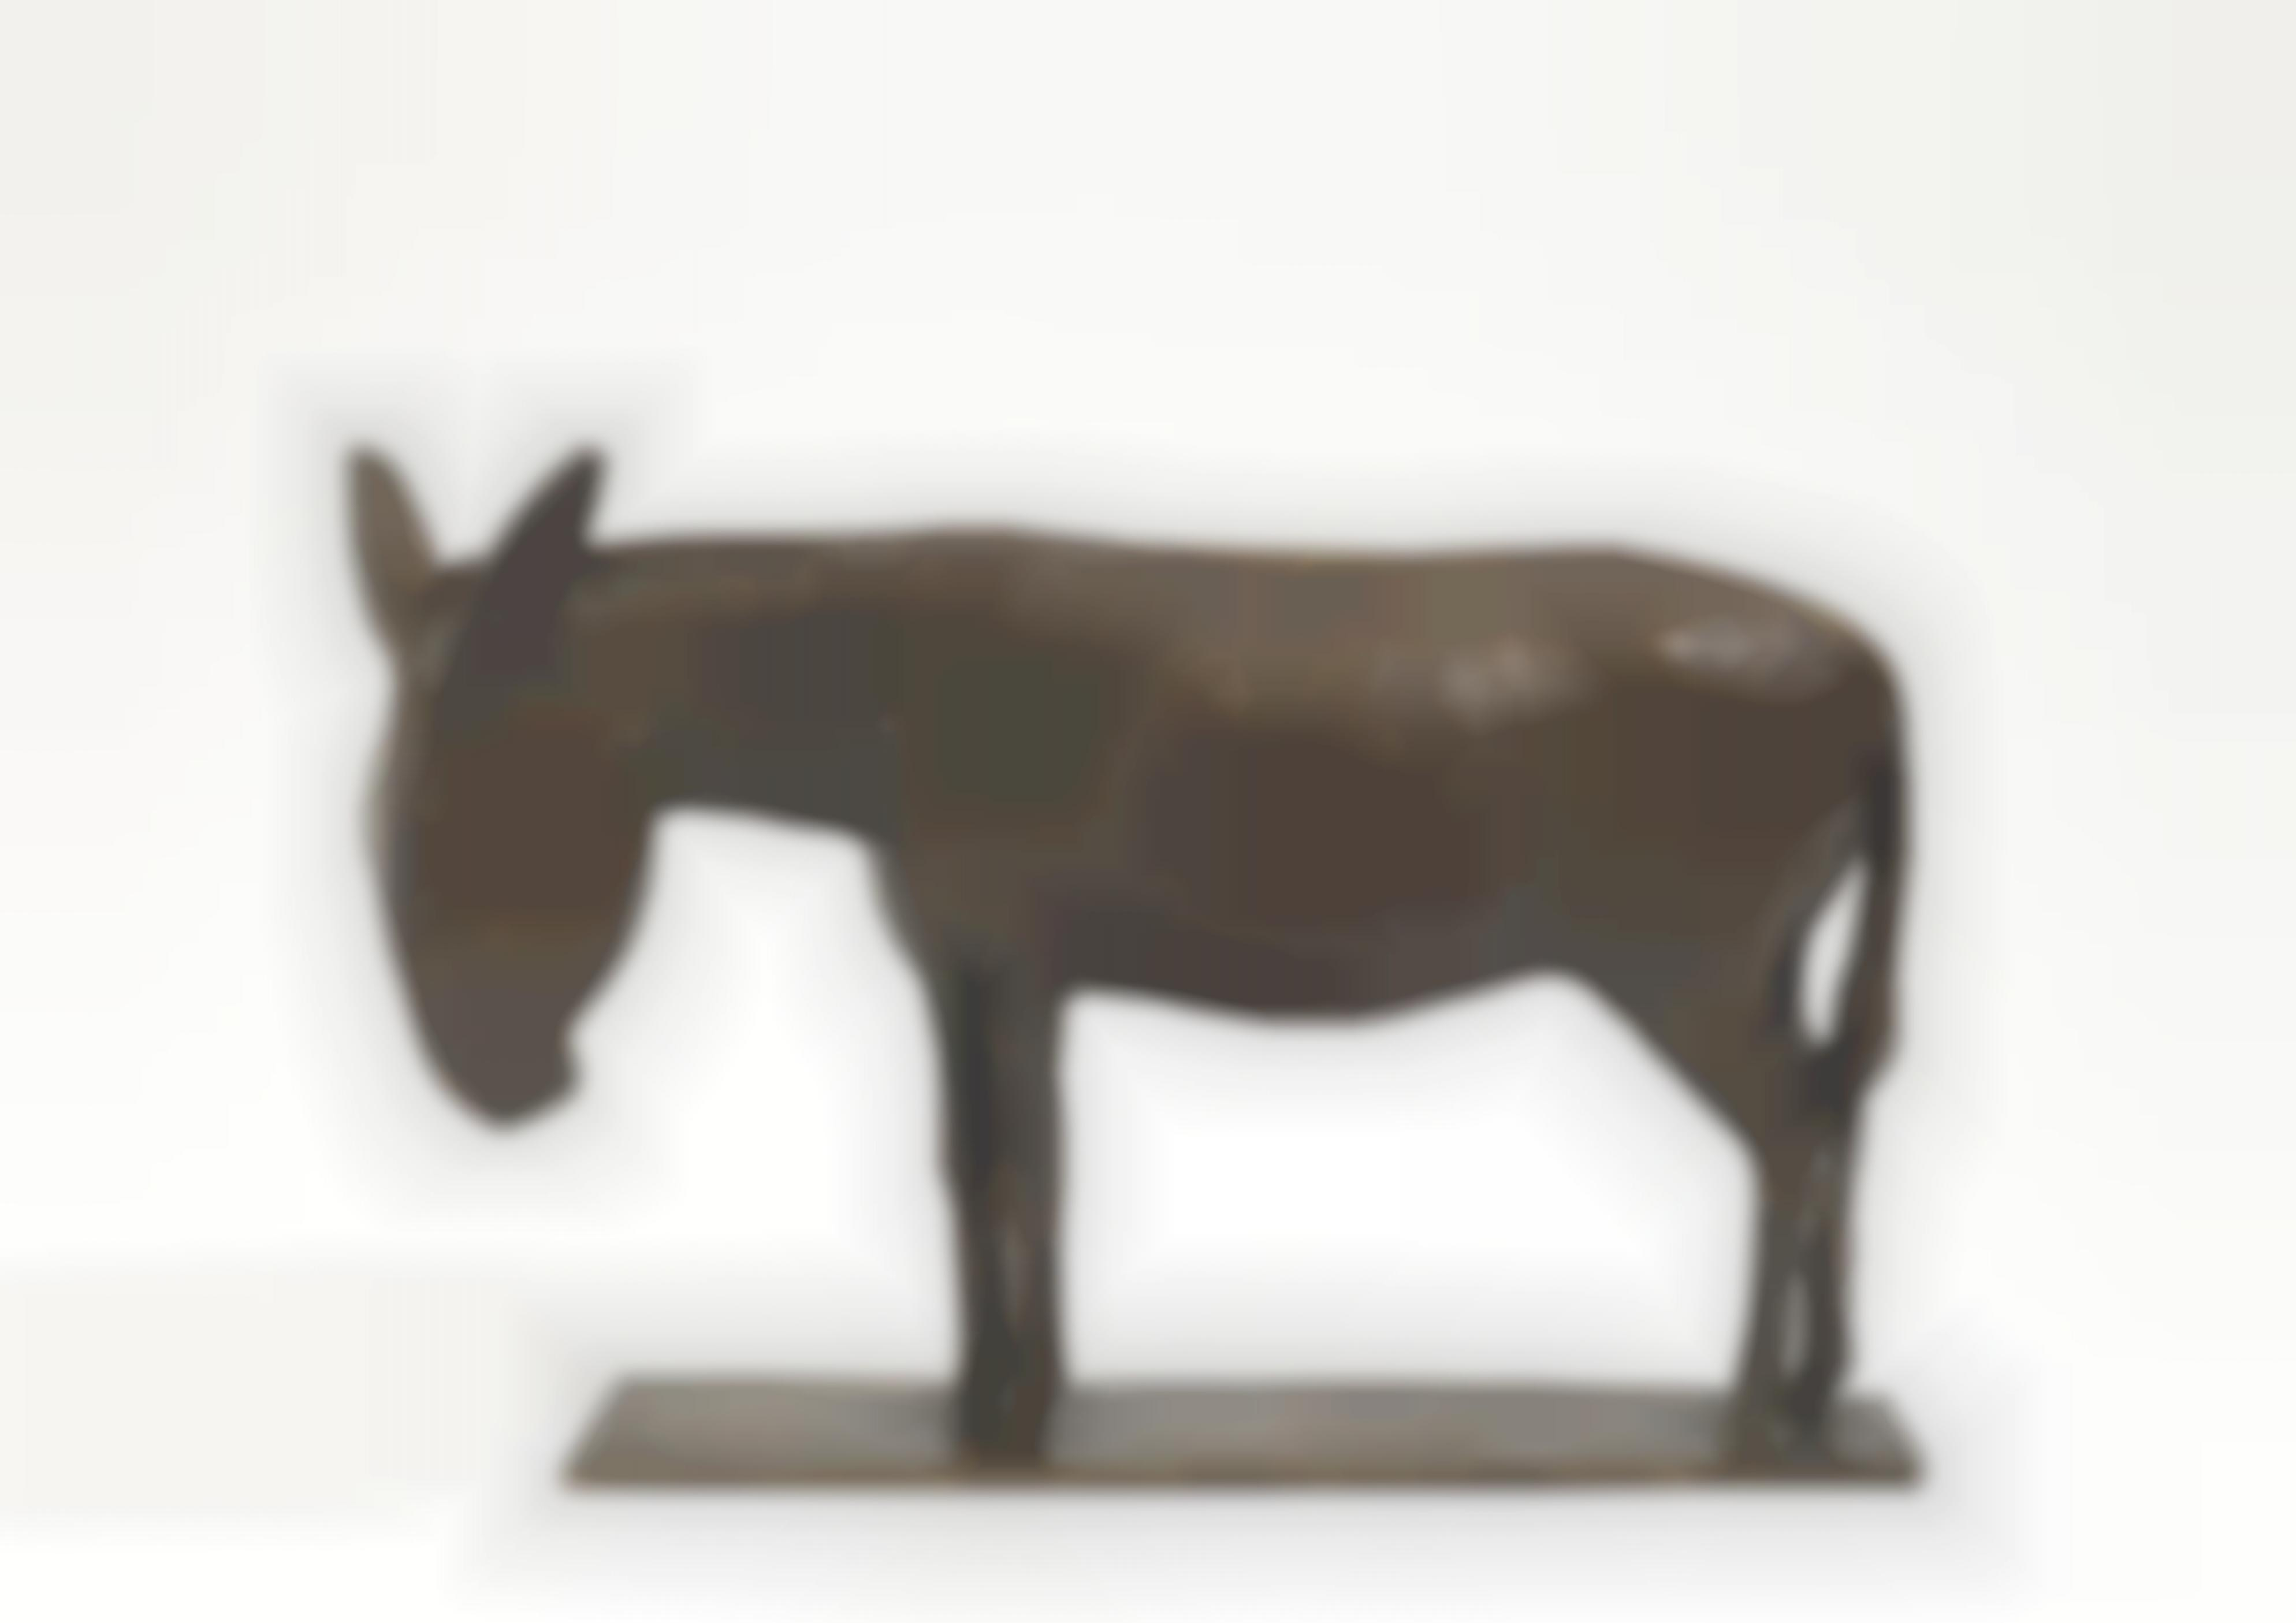 Erich Koch - Esel (Donkey)-